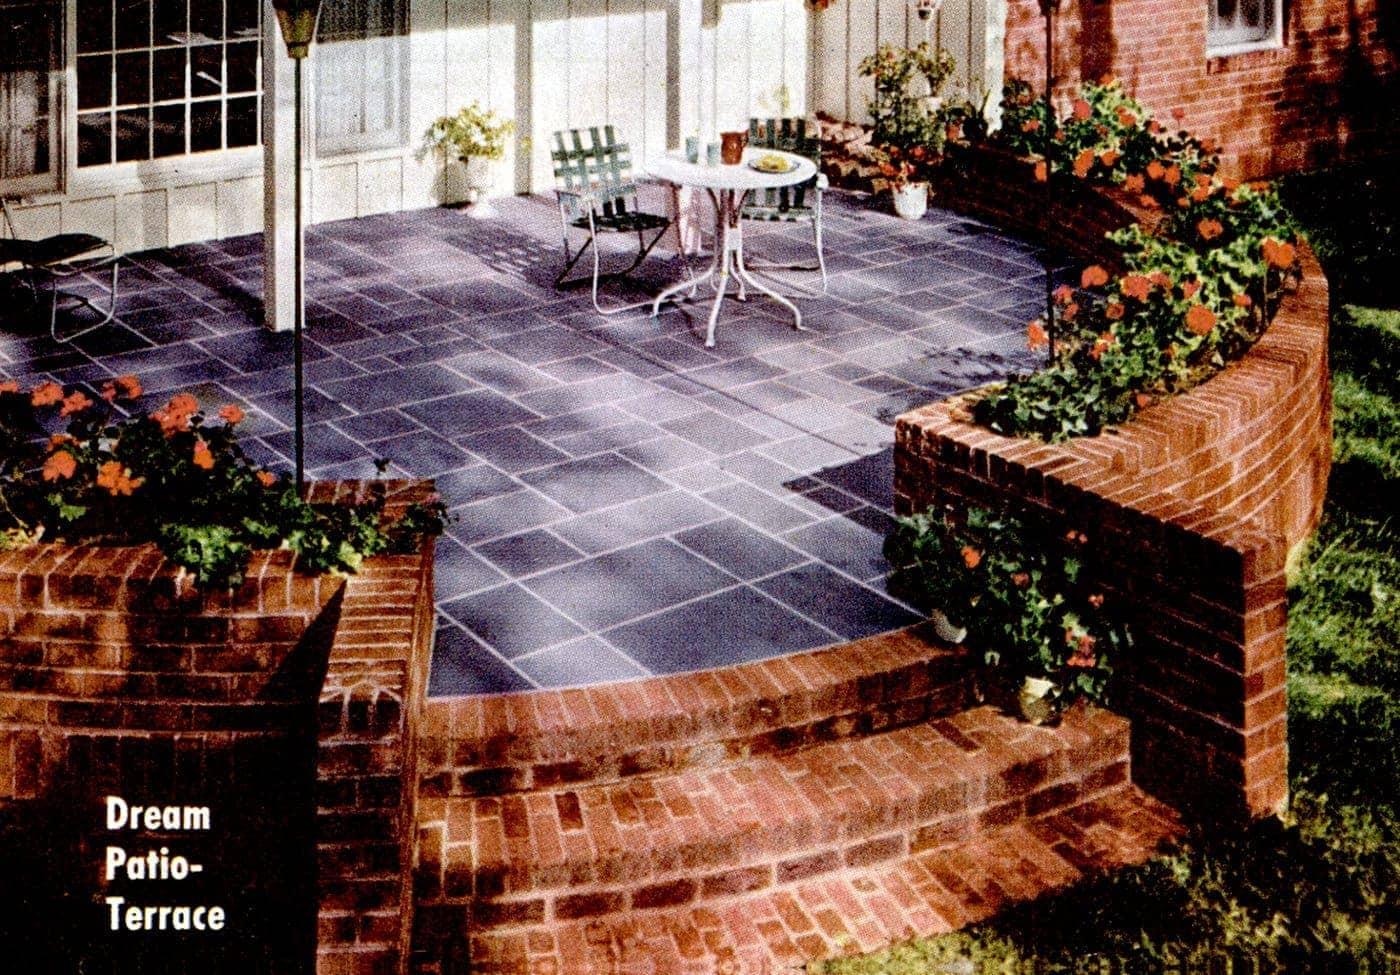 1964 - A dream patio-terrace